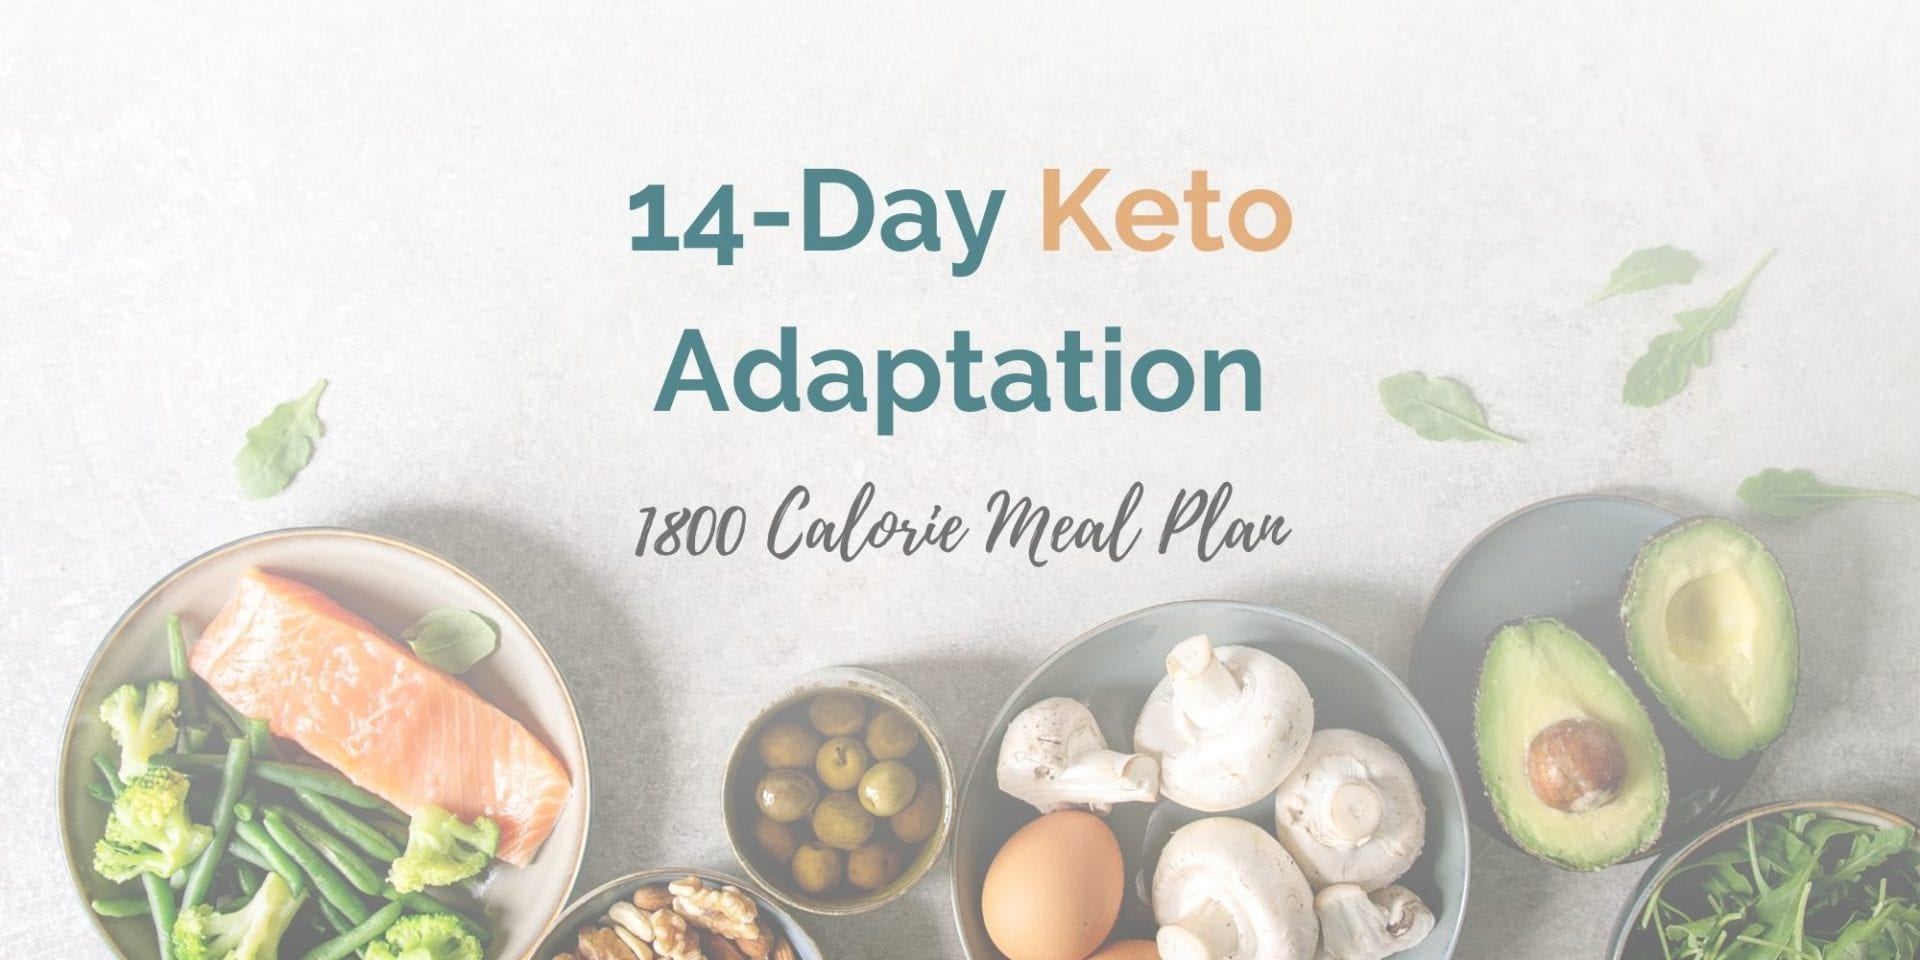 1,800 Calorie Keto Adaptation Meal Plan